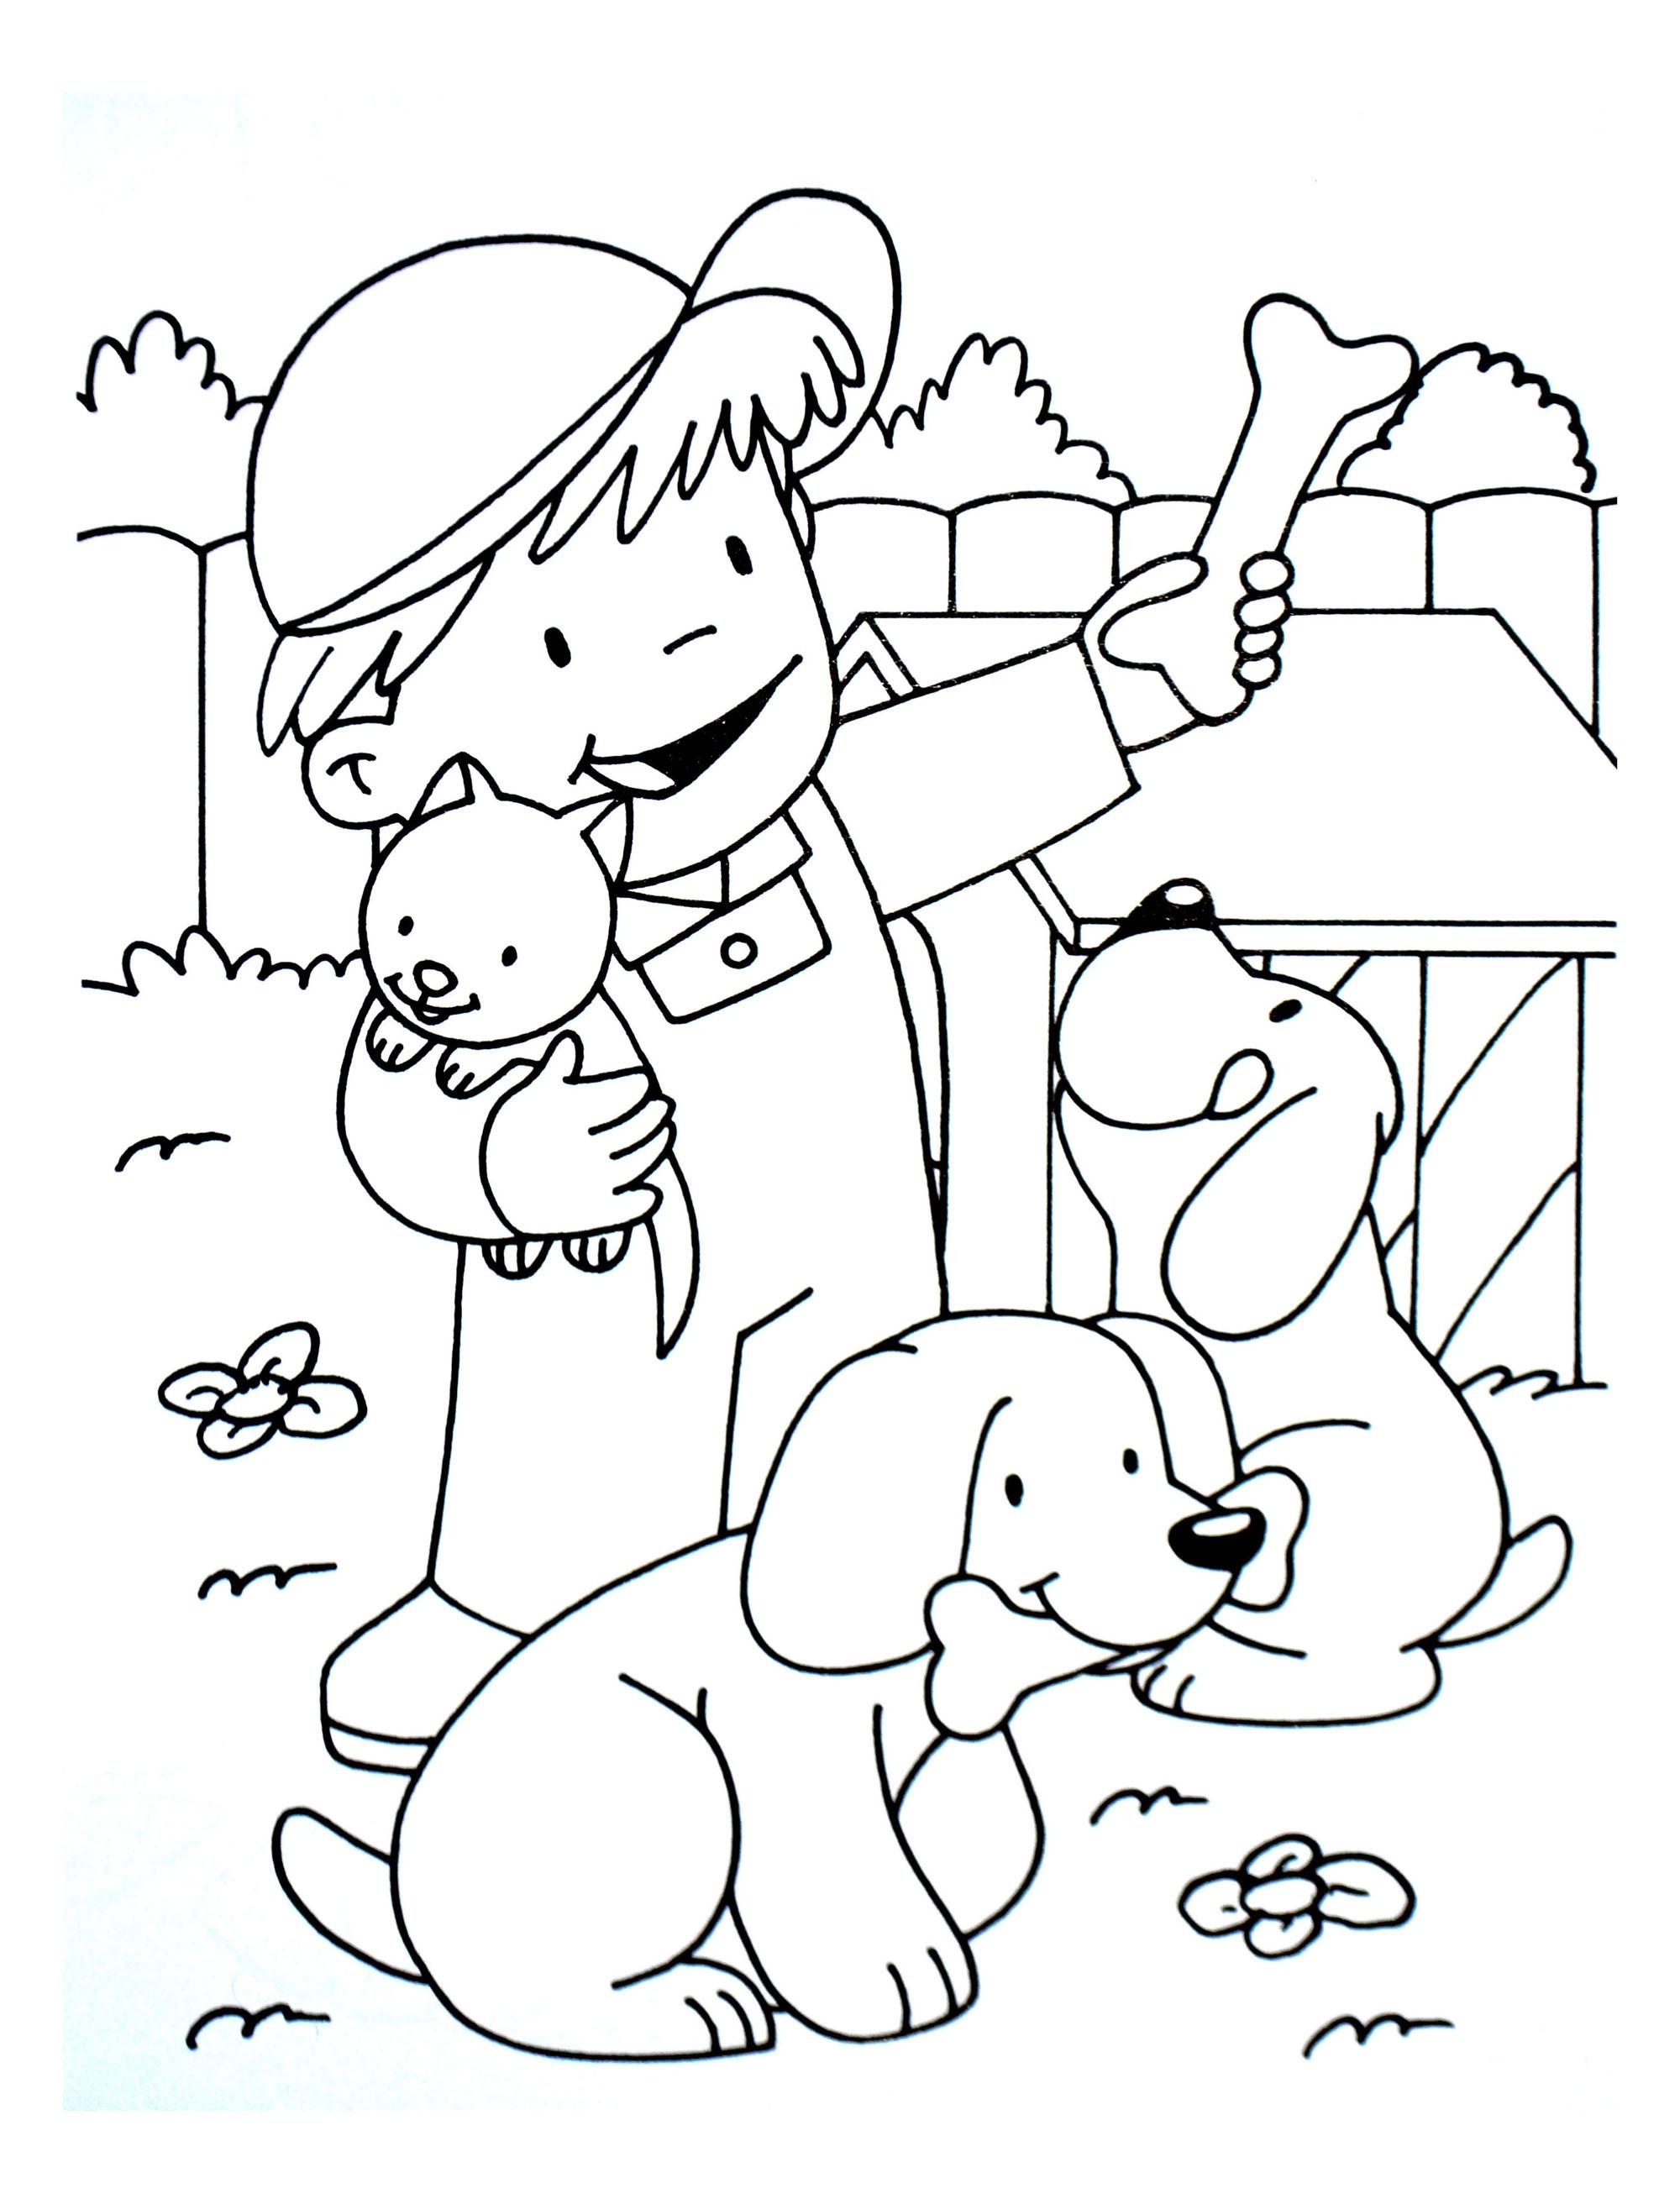 farm coloring pages kids - photo#25